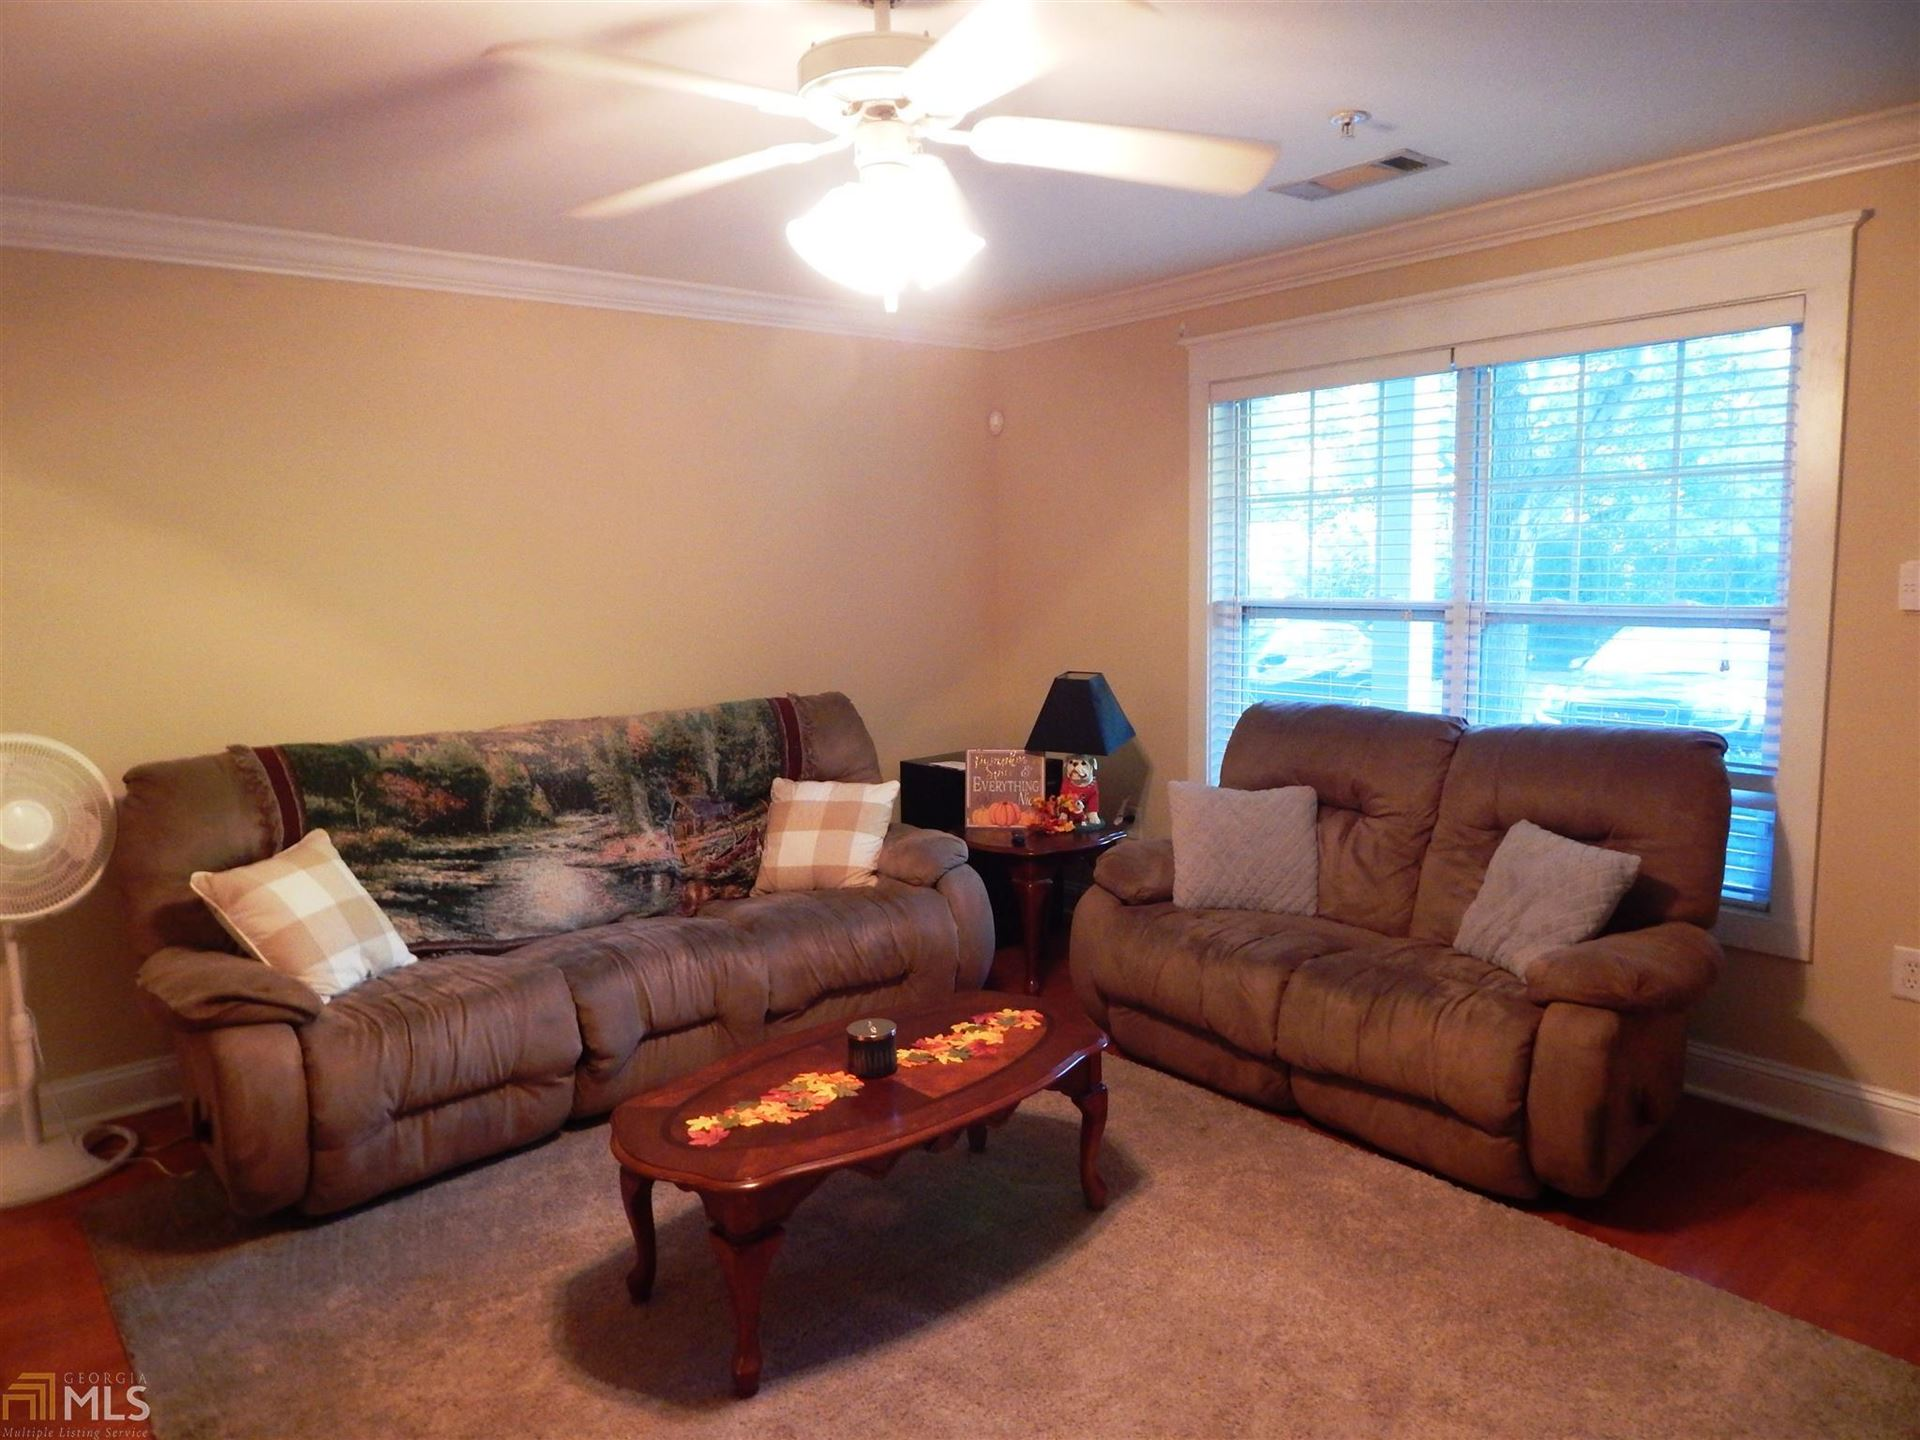 1035 Barnett Shoals Rd, Athens, GA 30605 - MLS#: 8878214